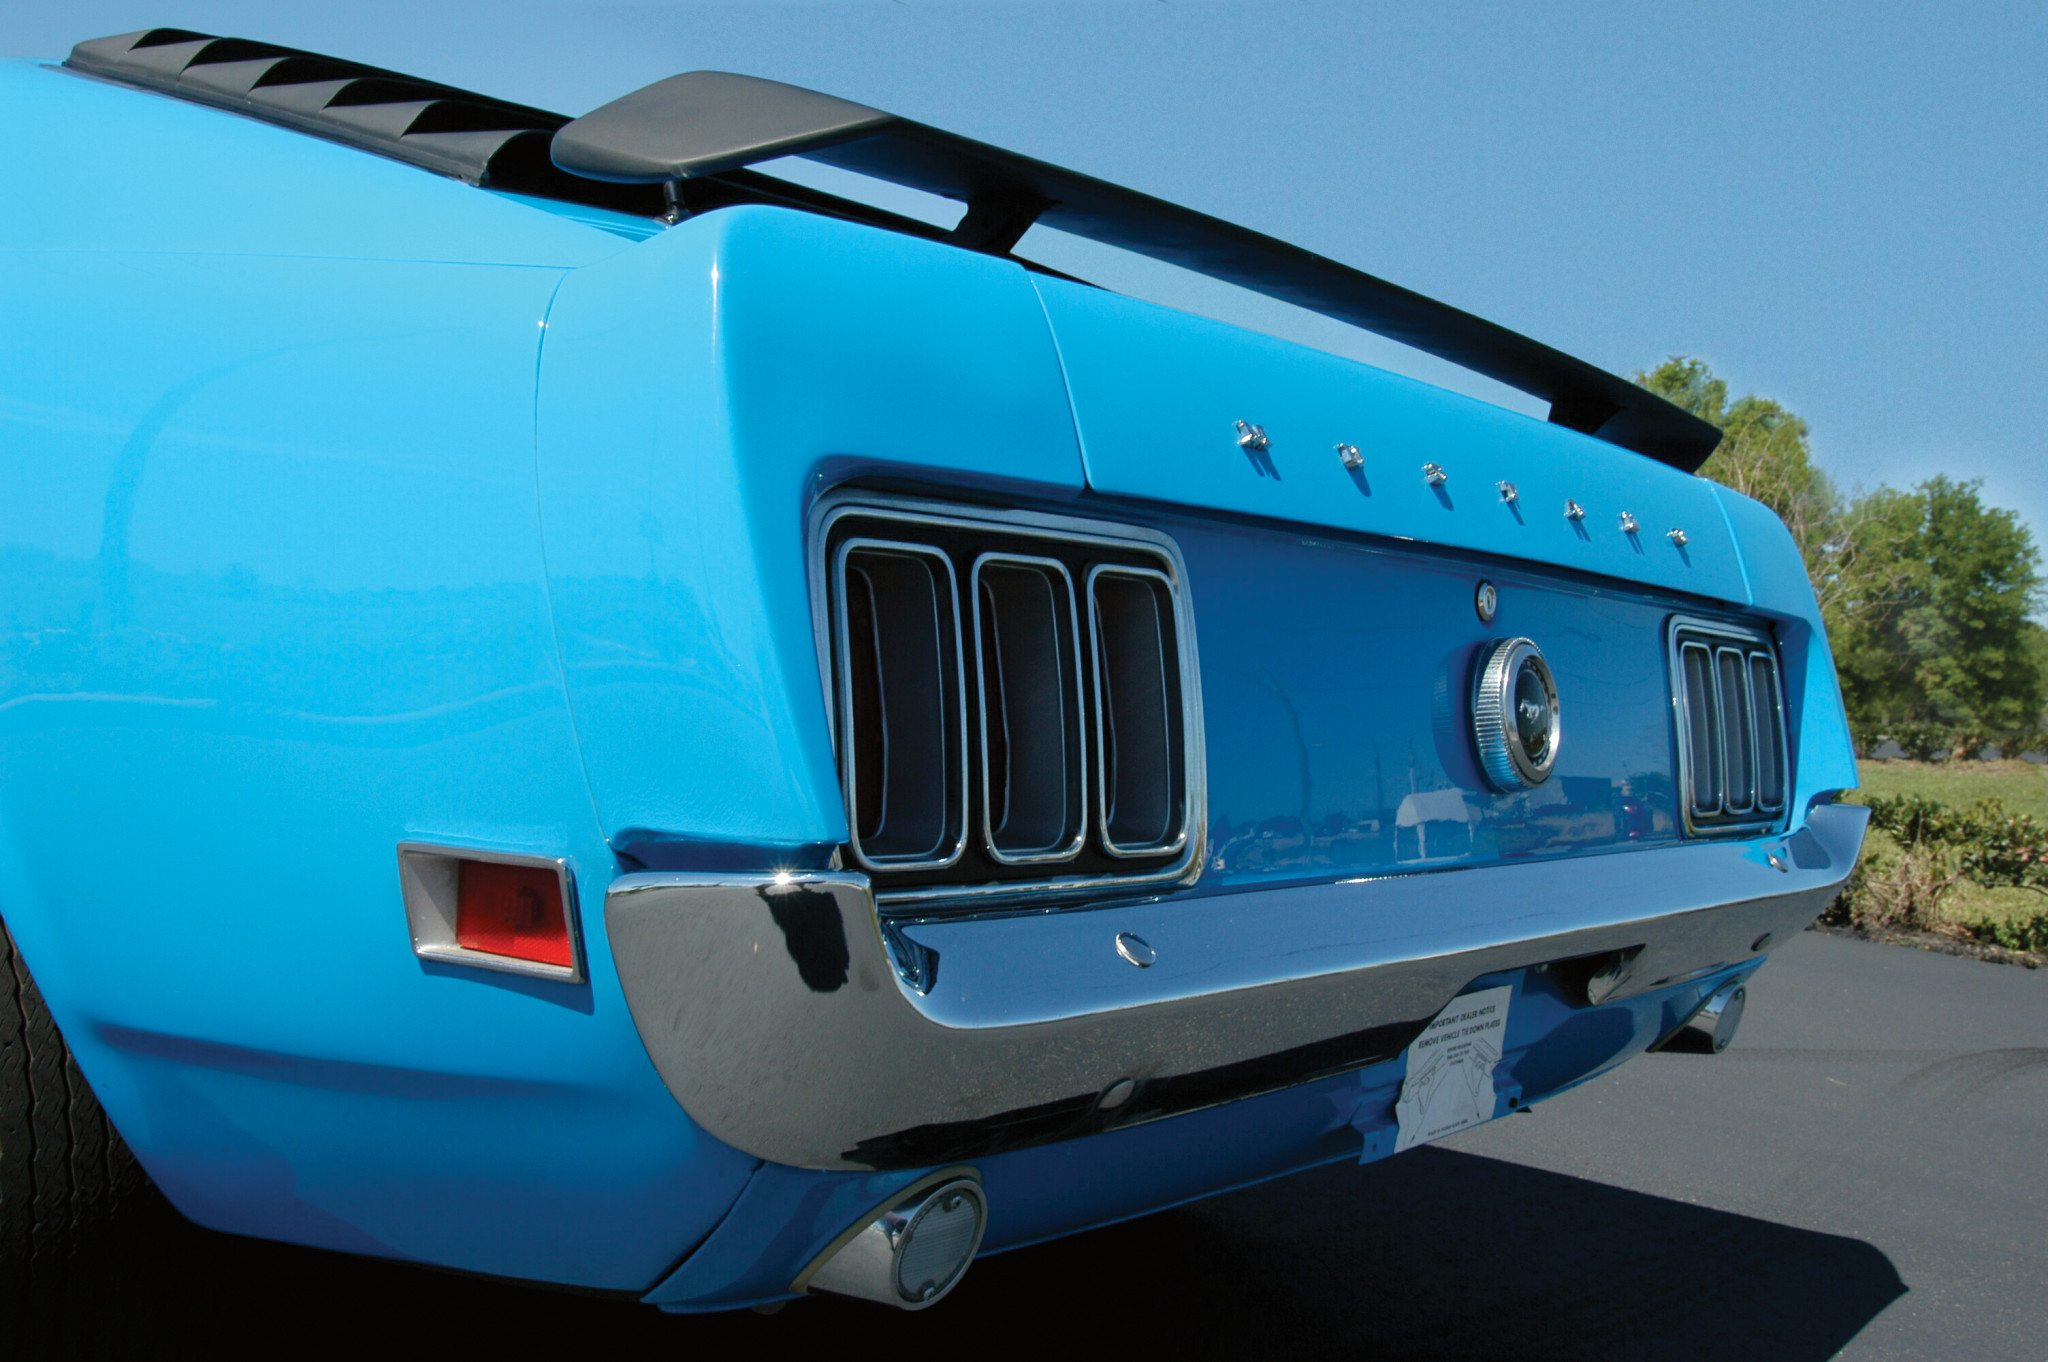 Boss 429 Mustang Rear View